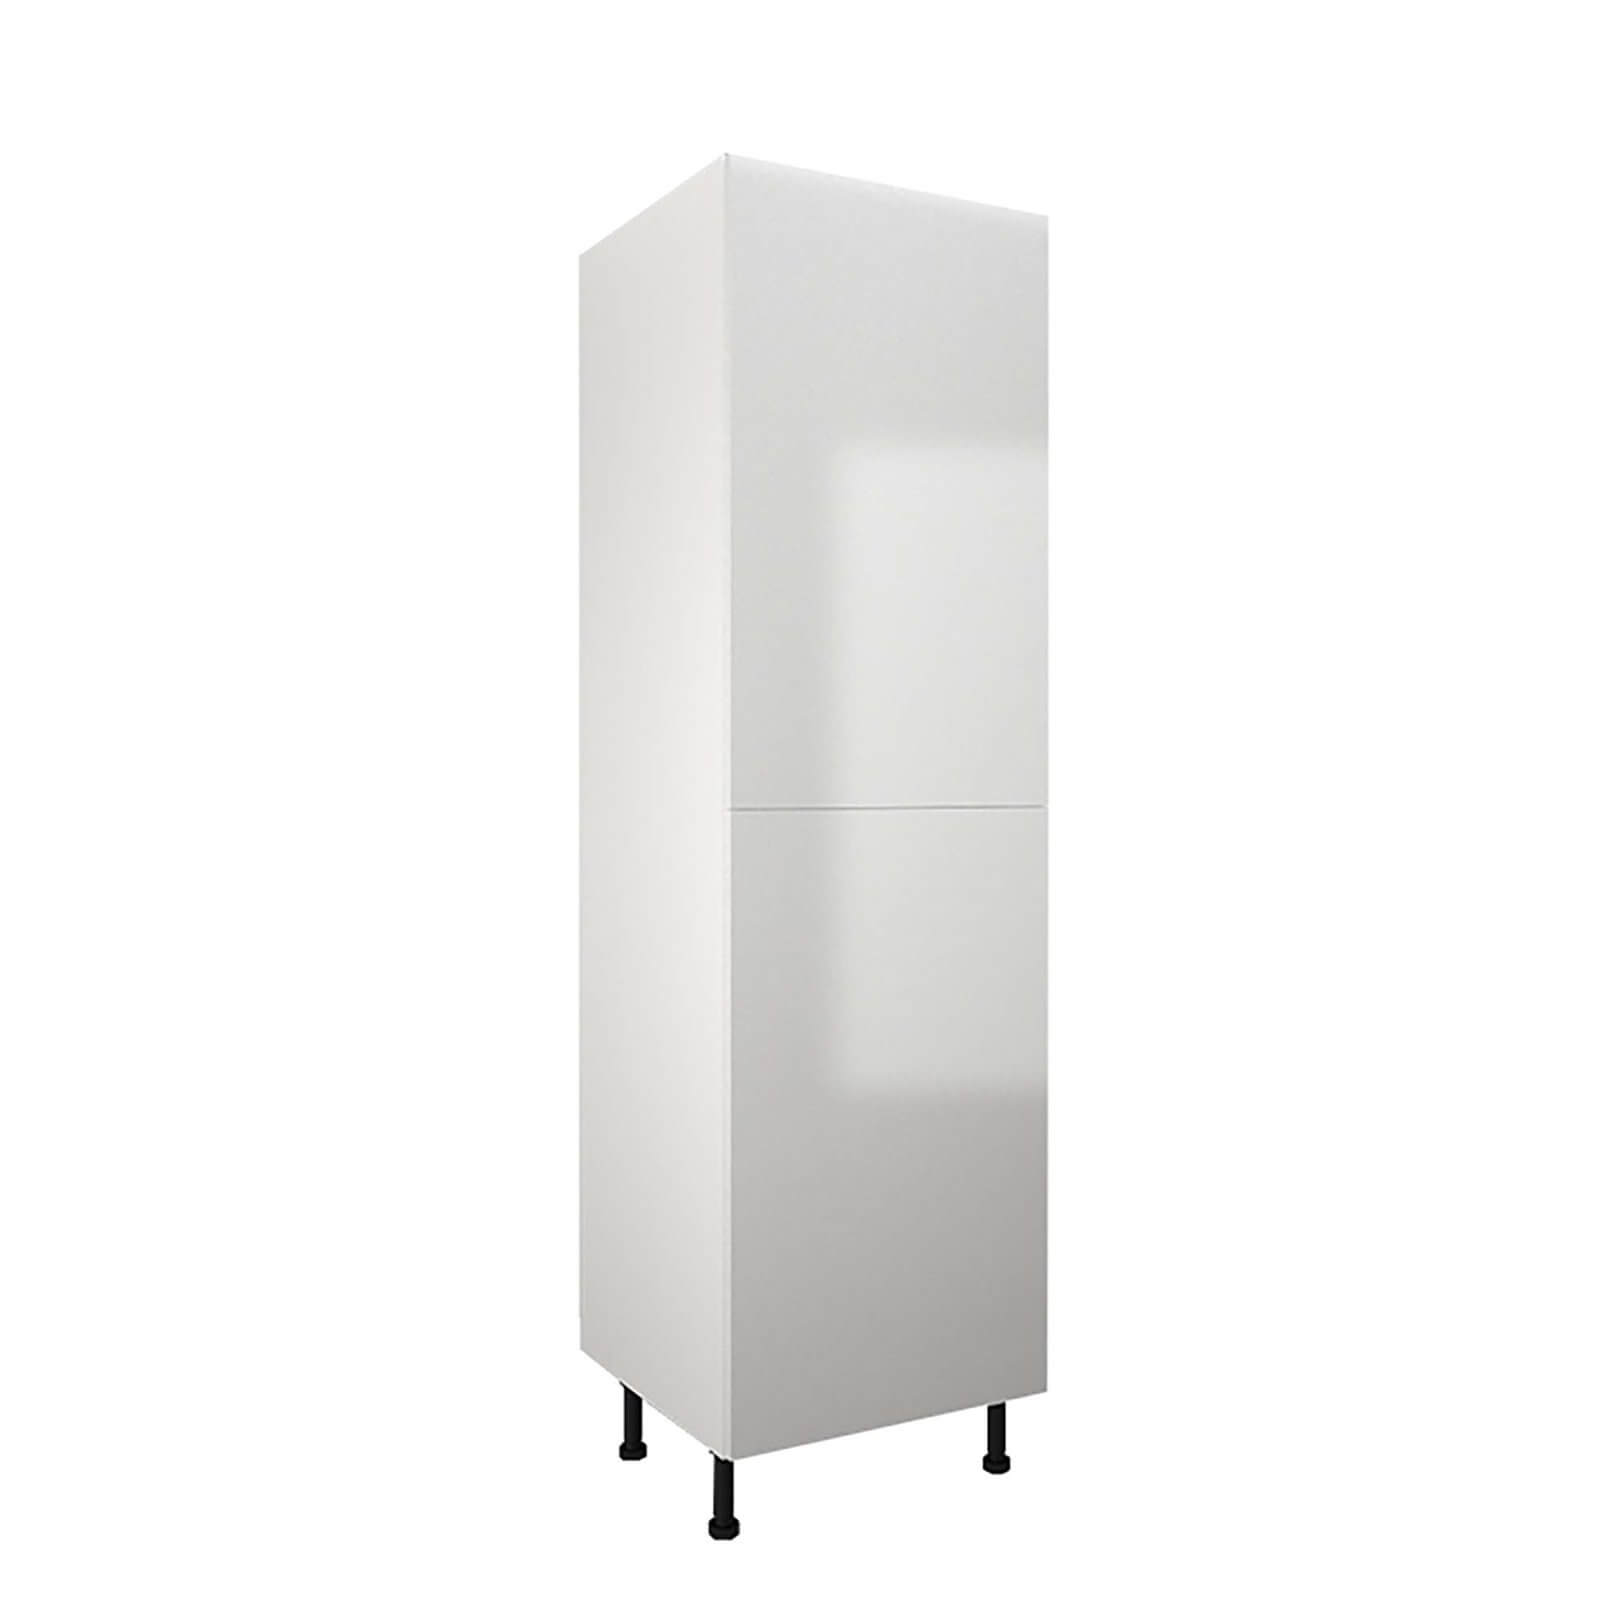 Gloss Slab White 600mm Larder 50:50 Fridge Freezer Unit